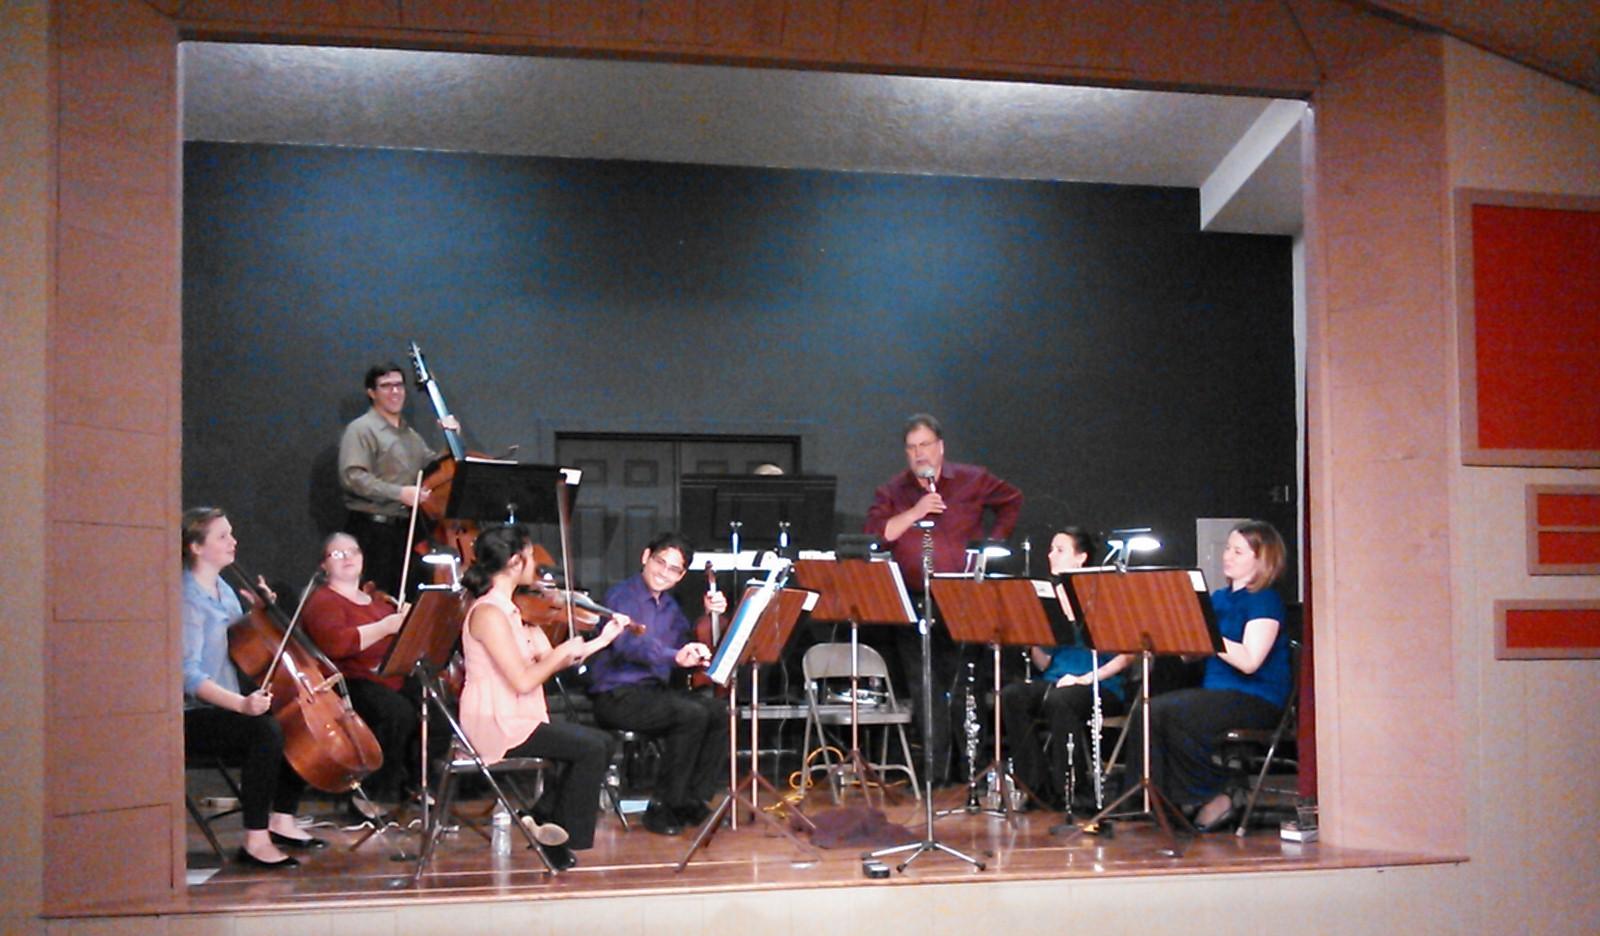 Thompson Opera House hosts traveling group